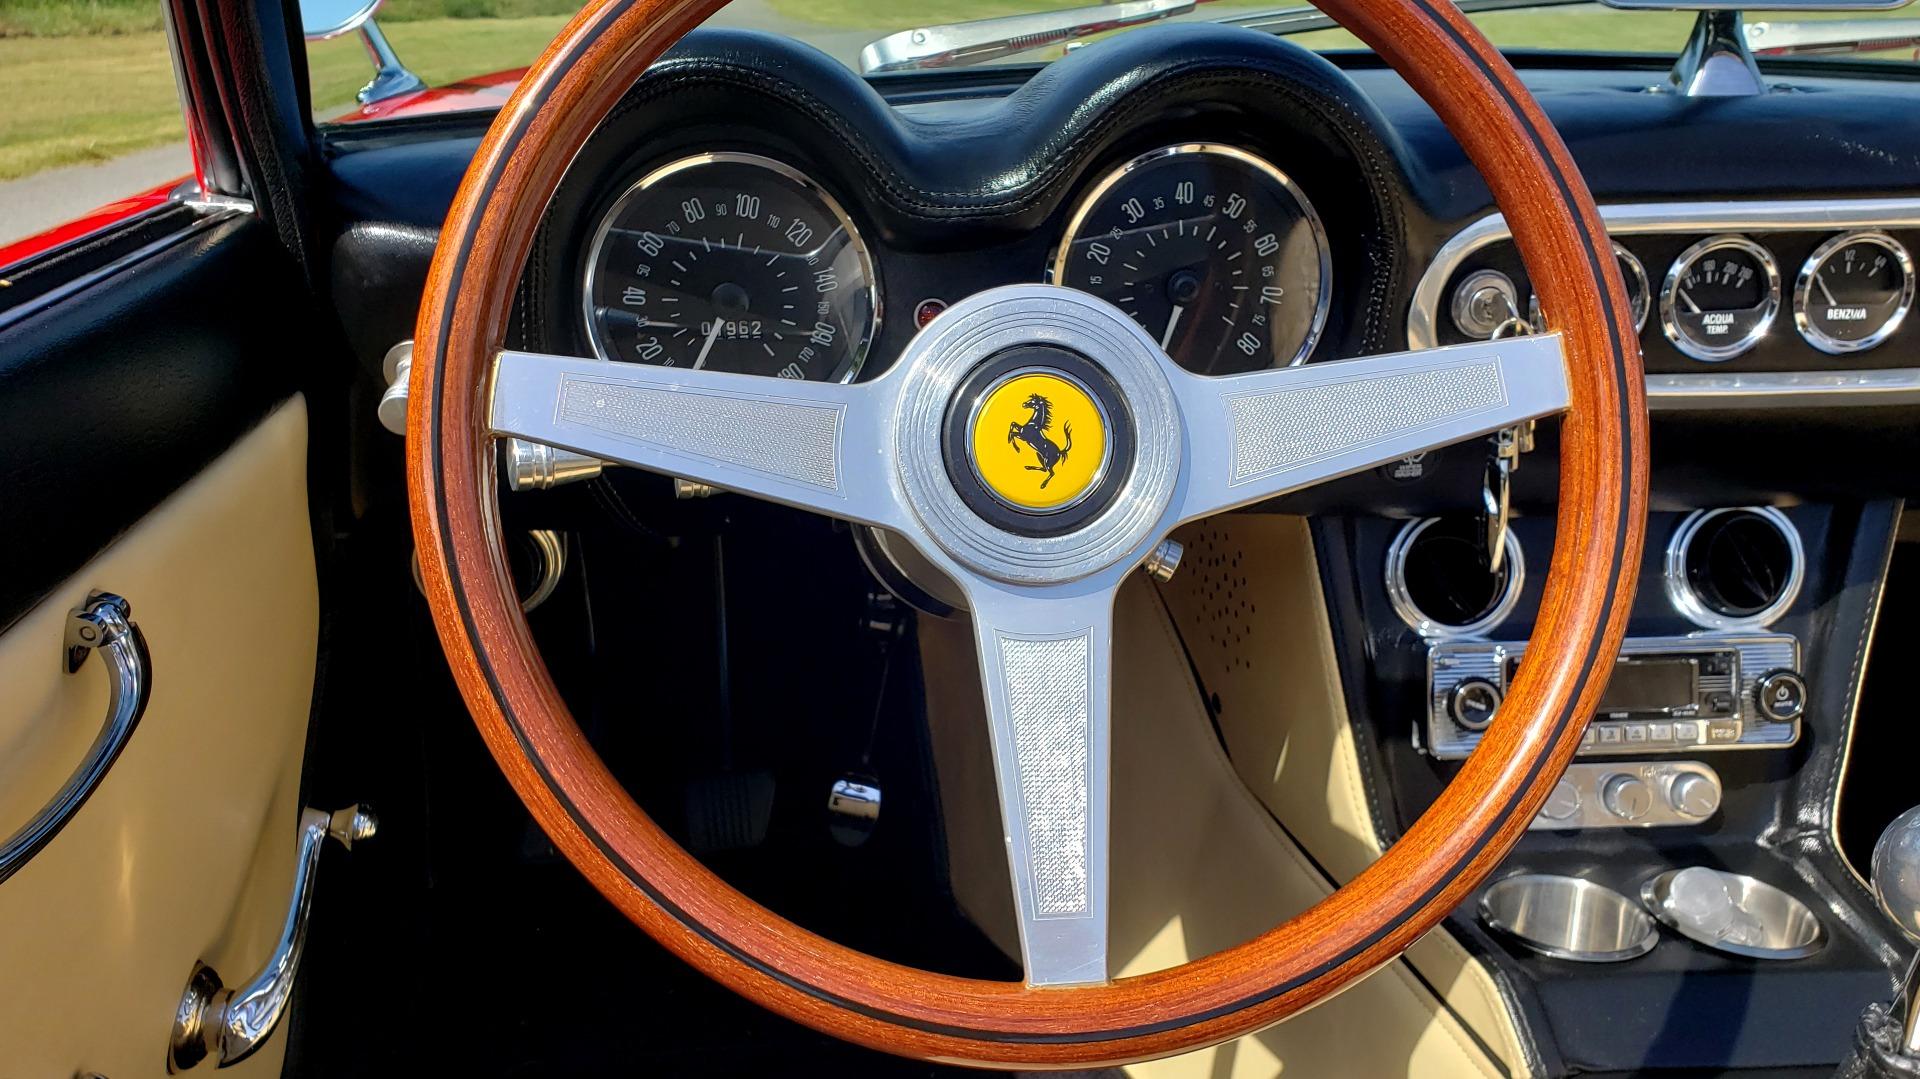 Used 1961 Ferrari 250GT SWB CALIFORNIA REPLICA / 302CI V8 / TREMEC 5-SPEED for sale Sold at Formula Imports in Charlotte NC 28227 21